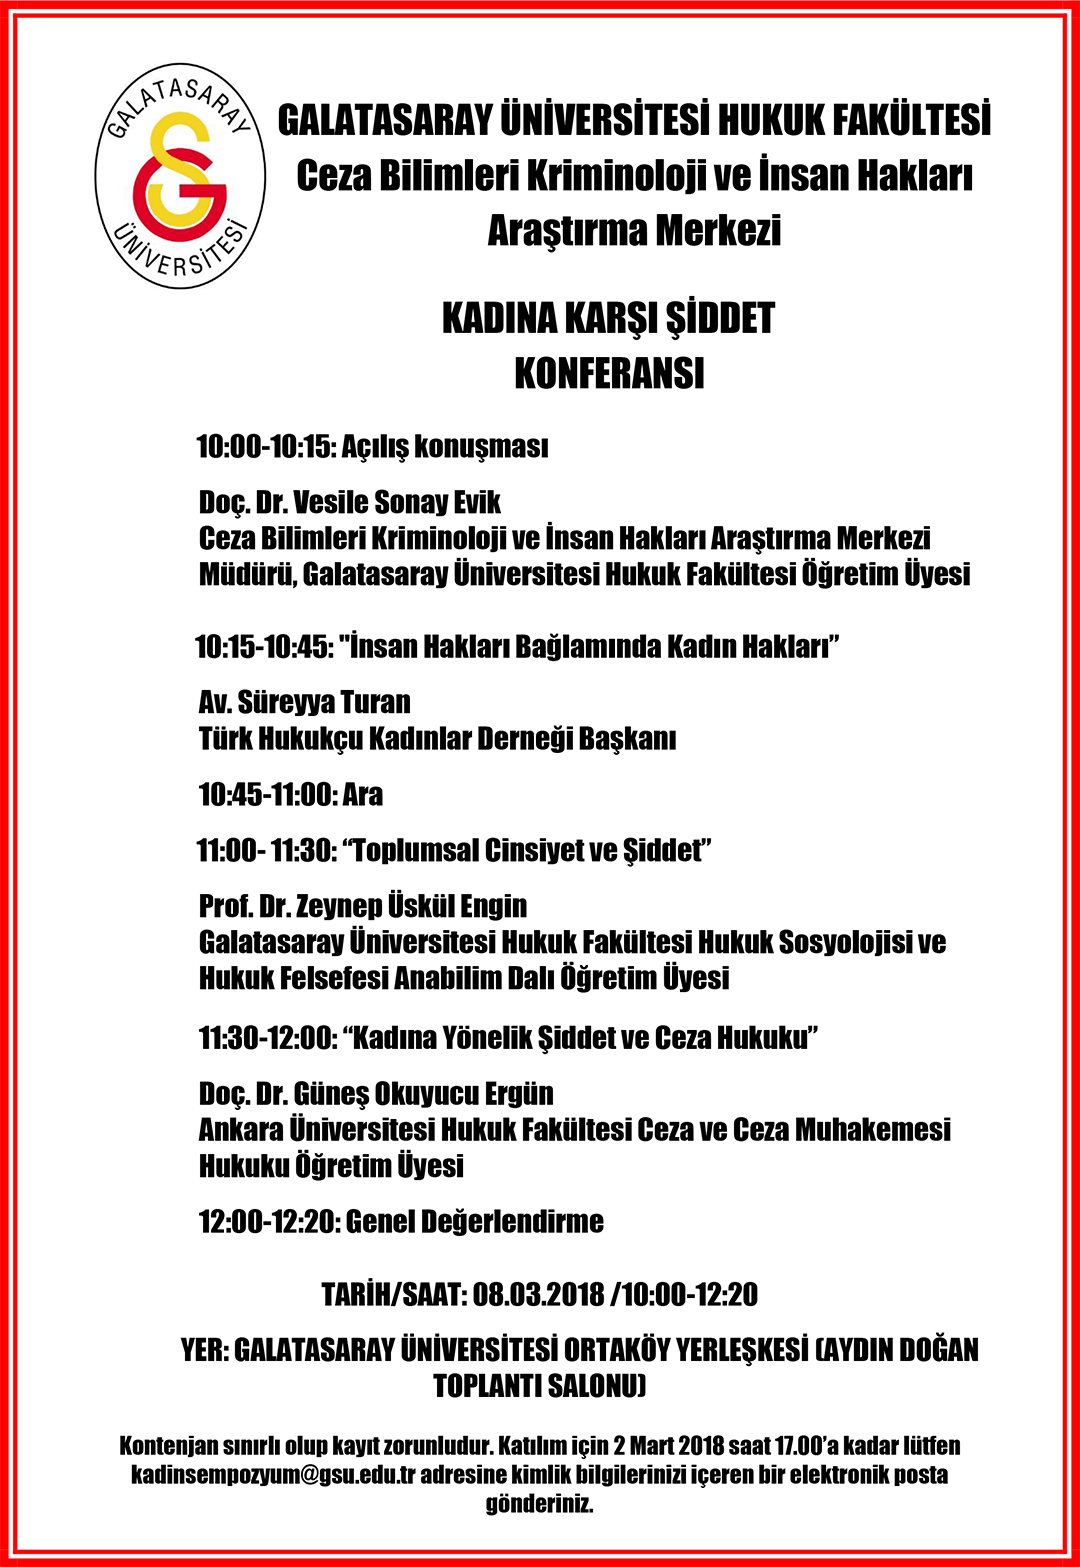 kadina-karsi-siddet-konferansi